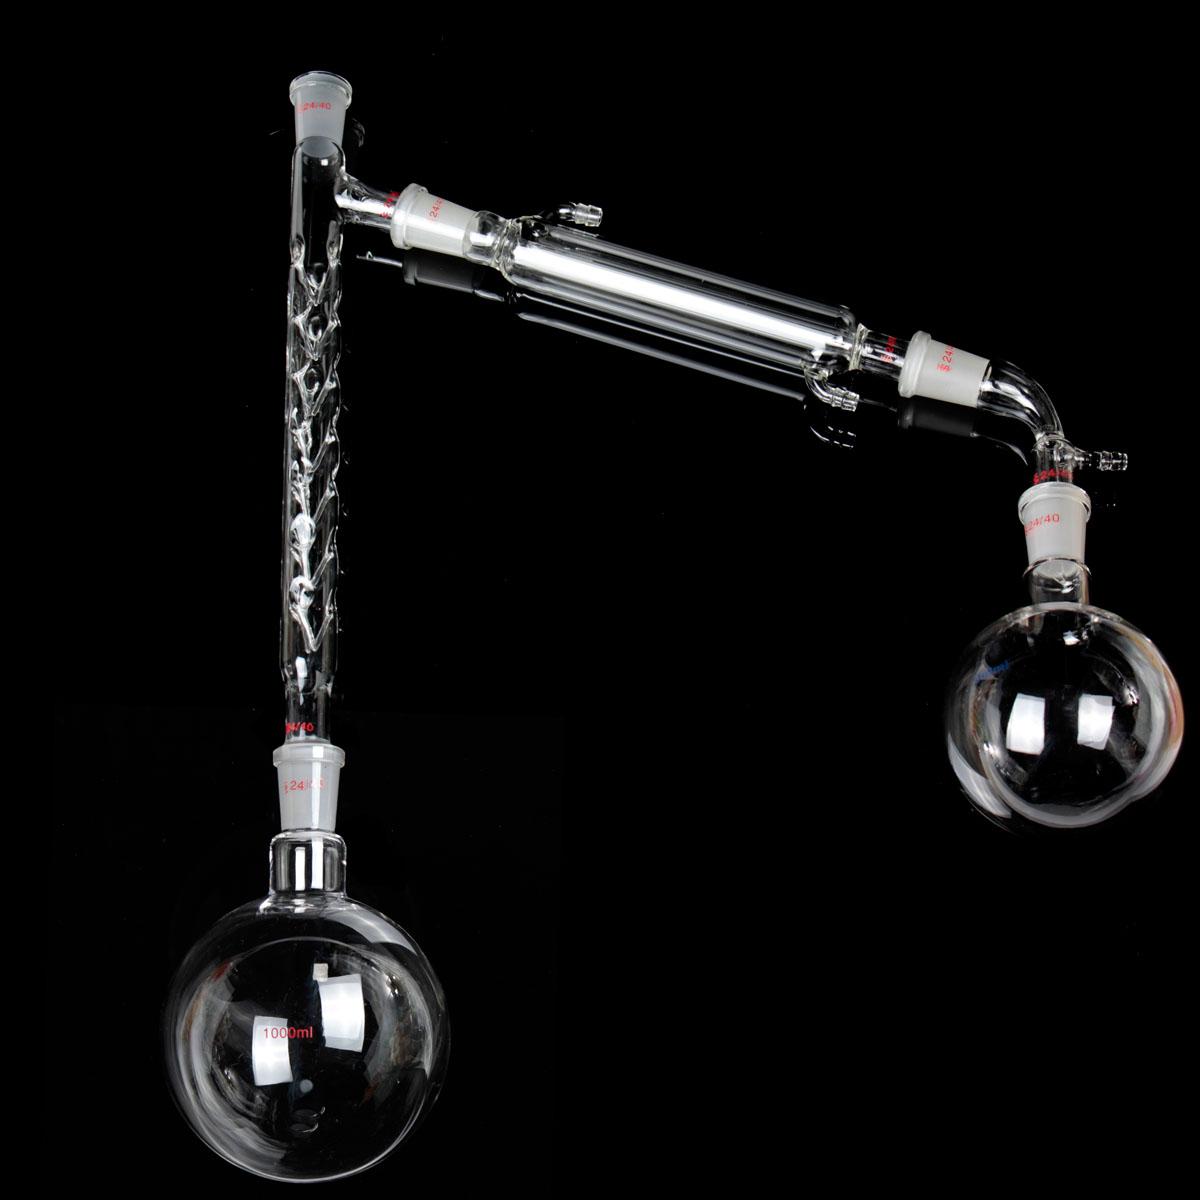 1000mL 24/40 Distillation Glass Apparatus Vacuum Distill Kit Vigreux Column Laboratory Glassware Kit